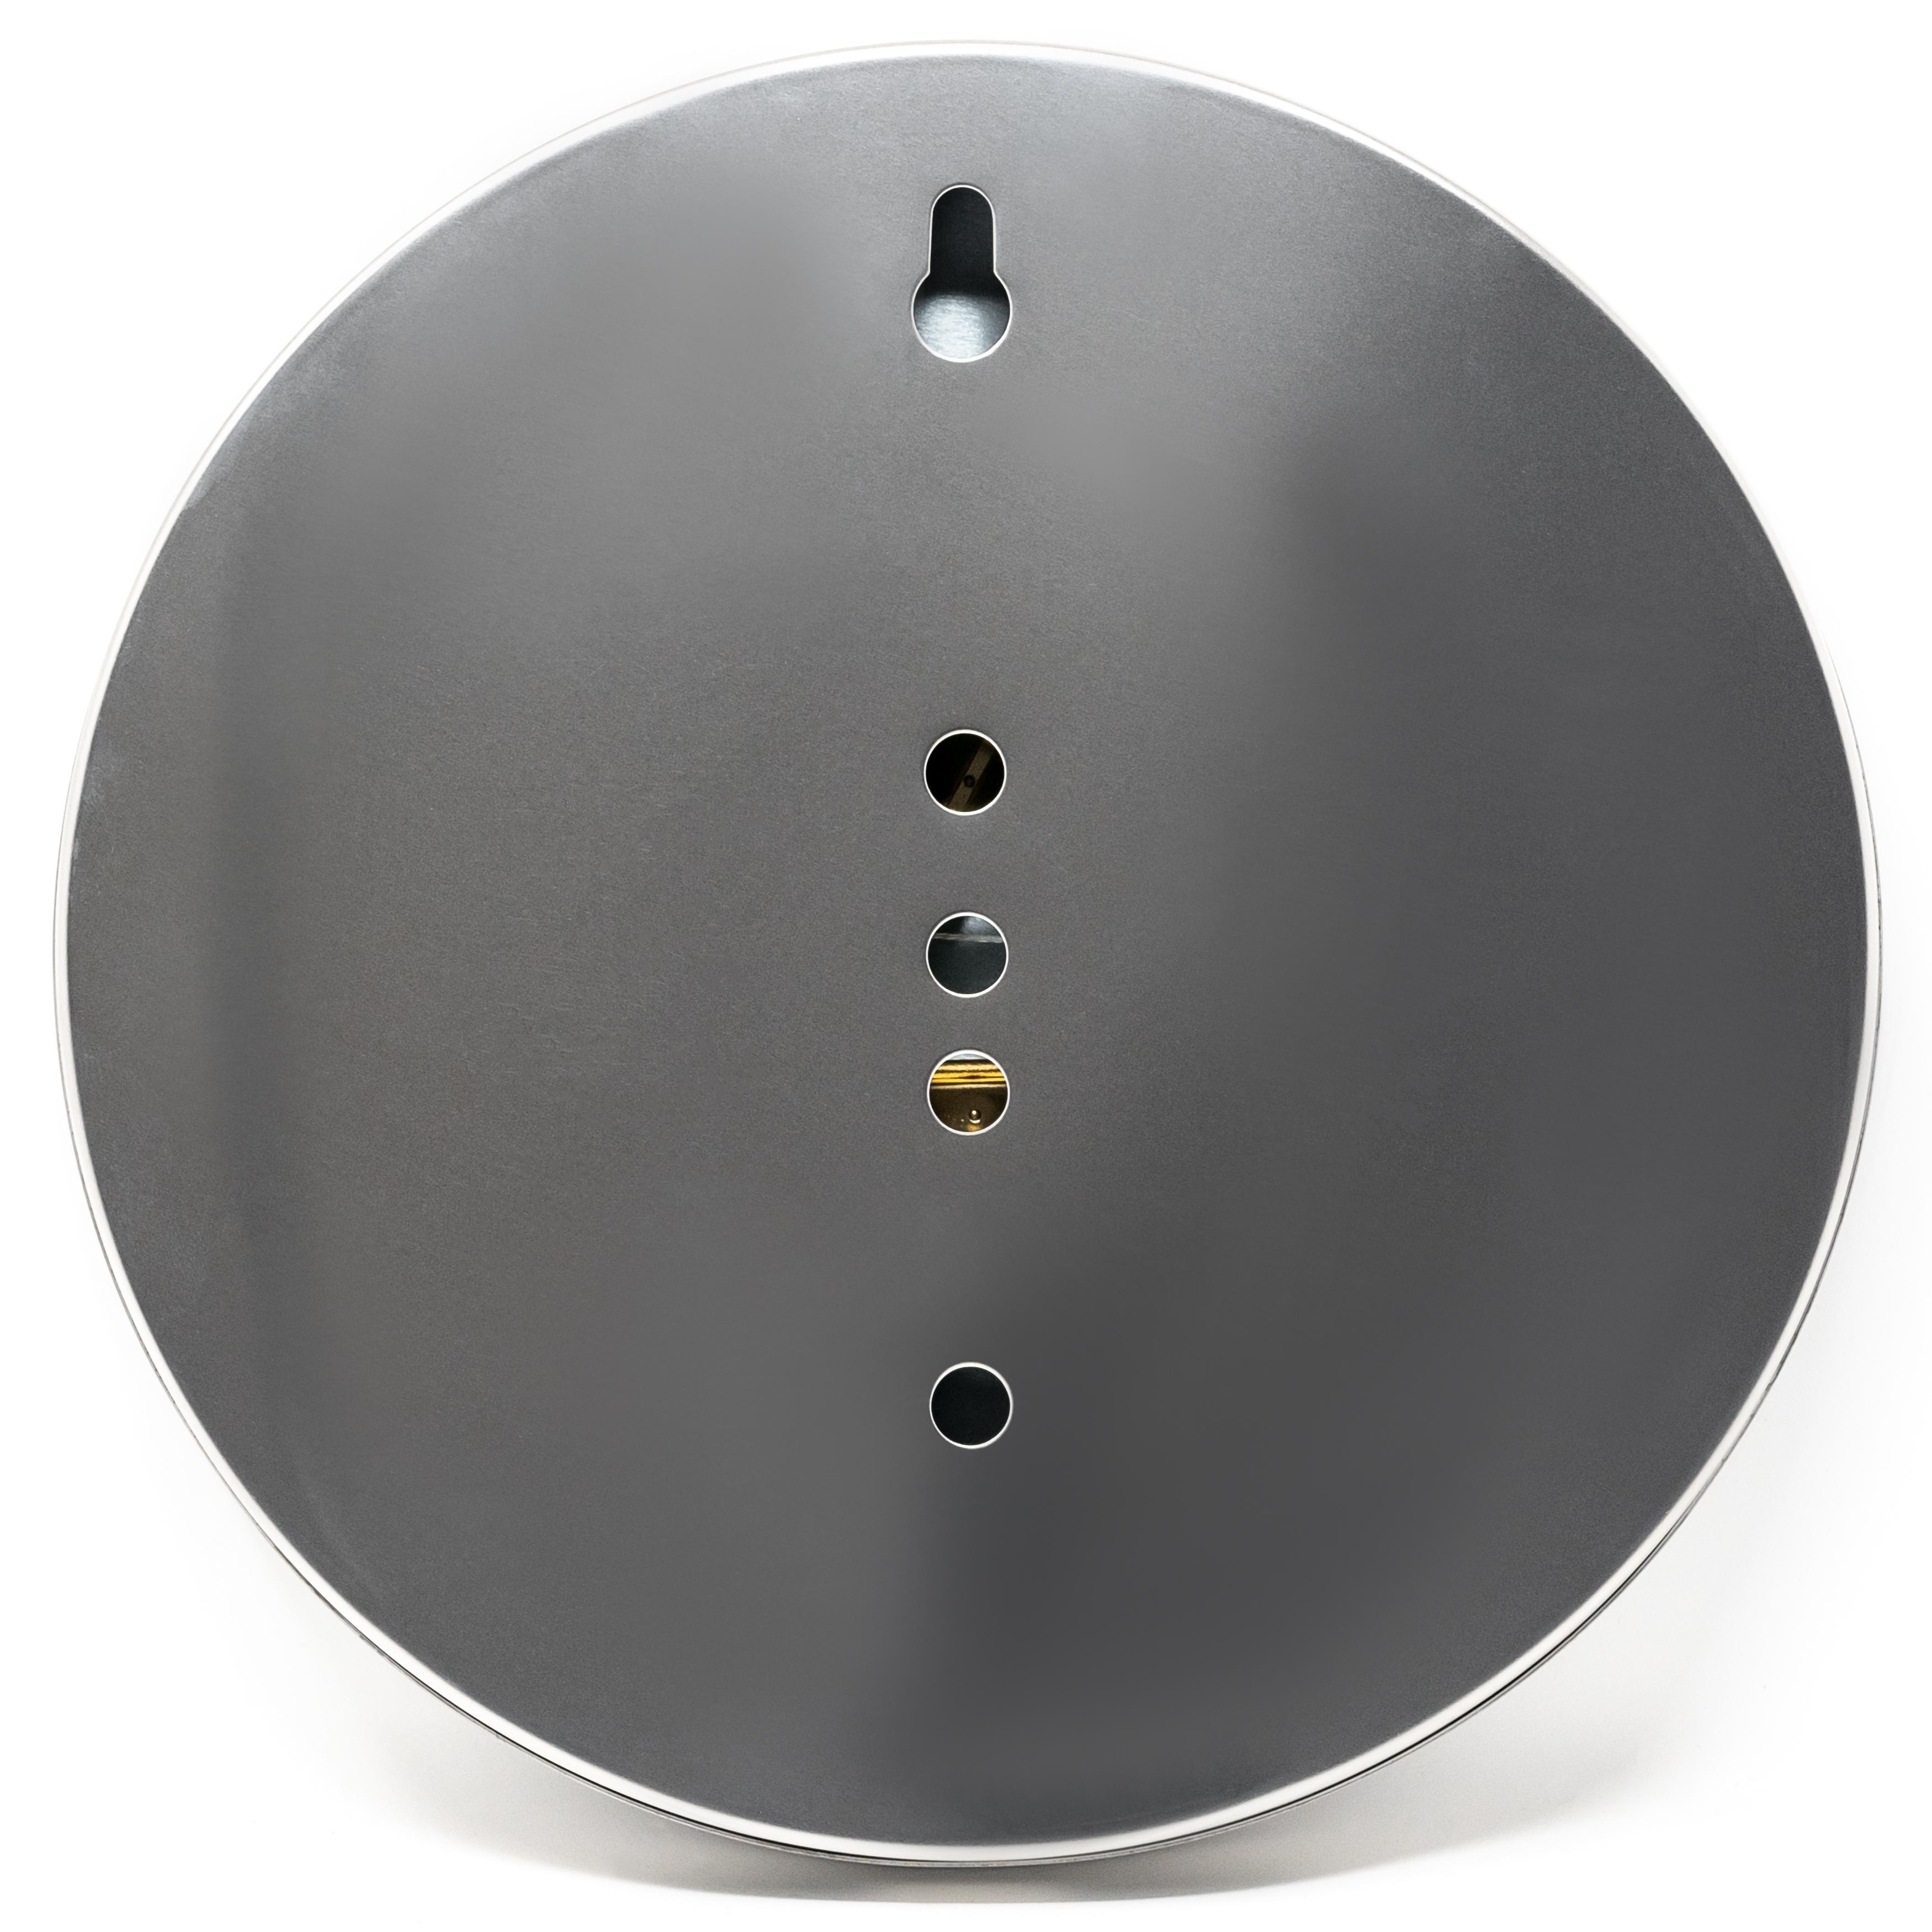 Sauna-Thermohygrometer Edelstahlgehäuse Ø 130 mm